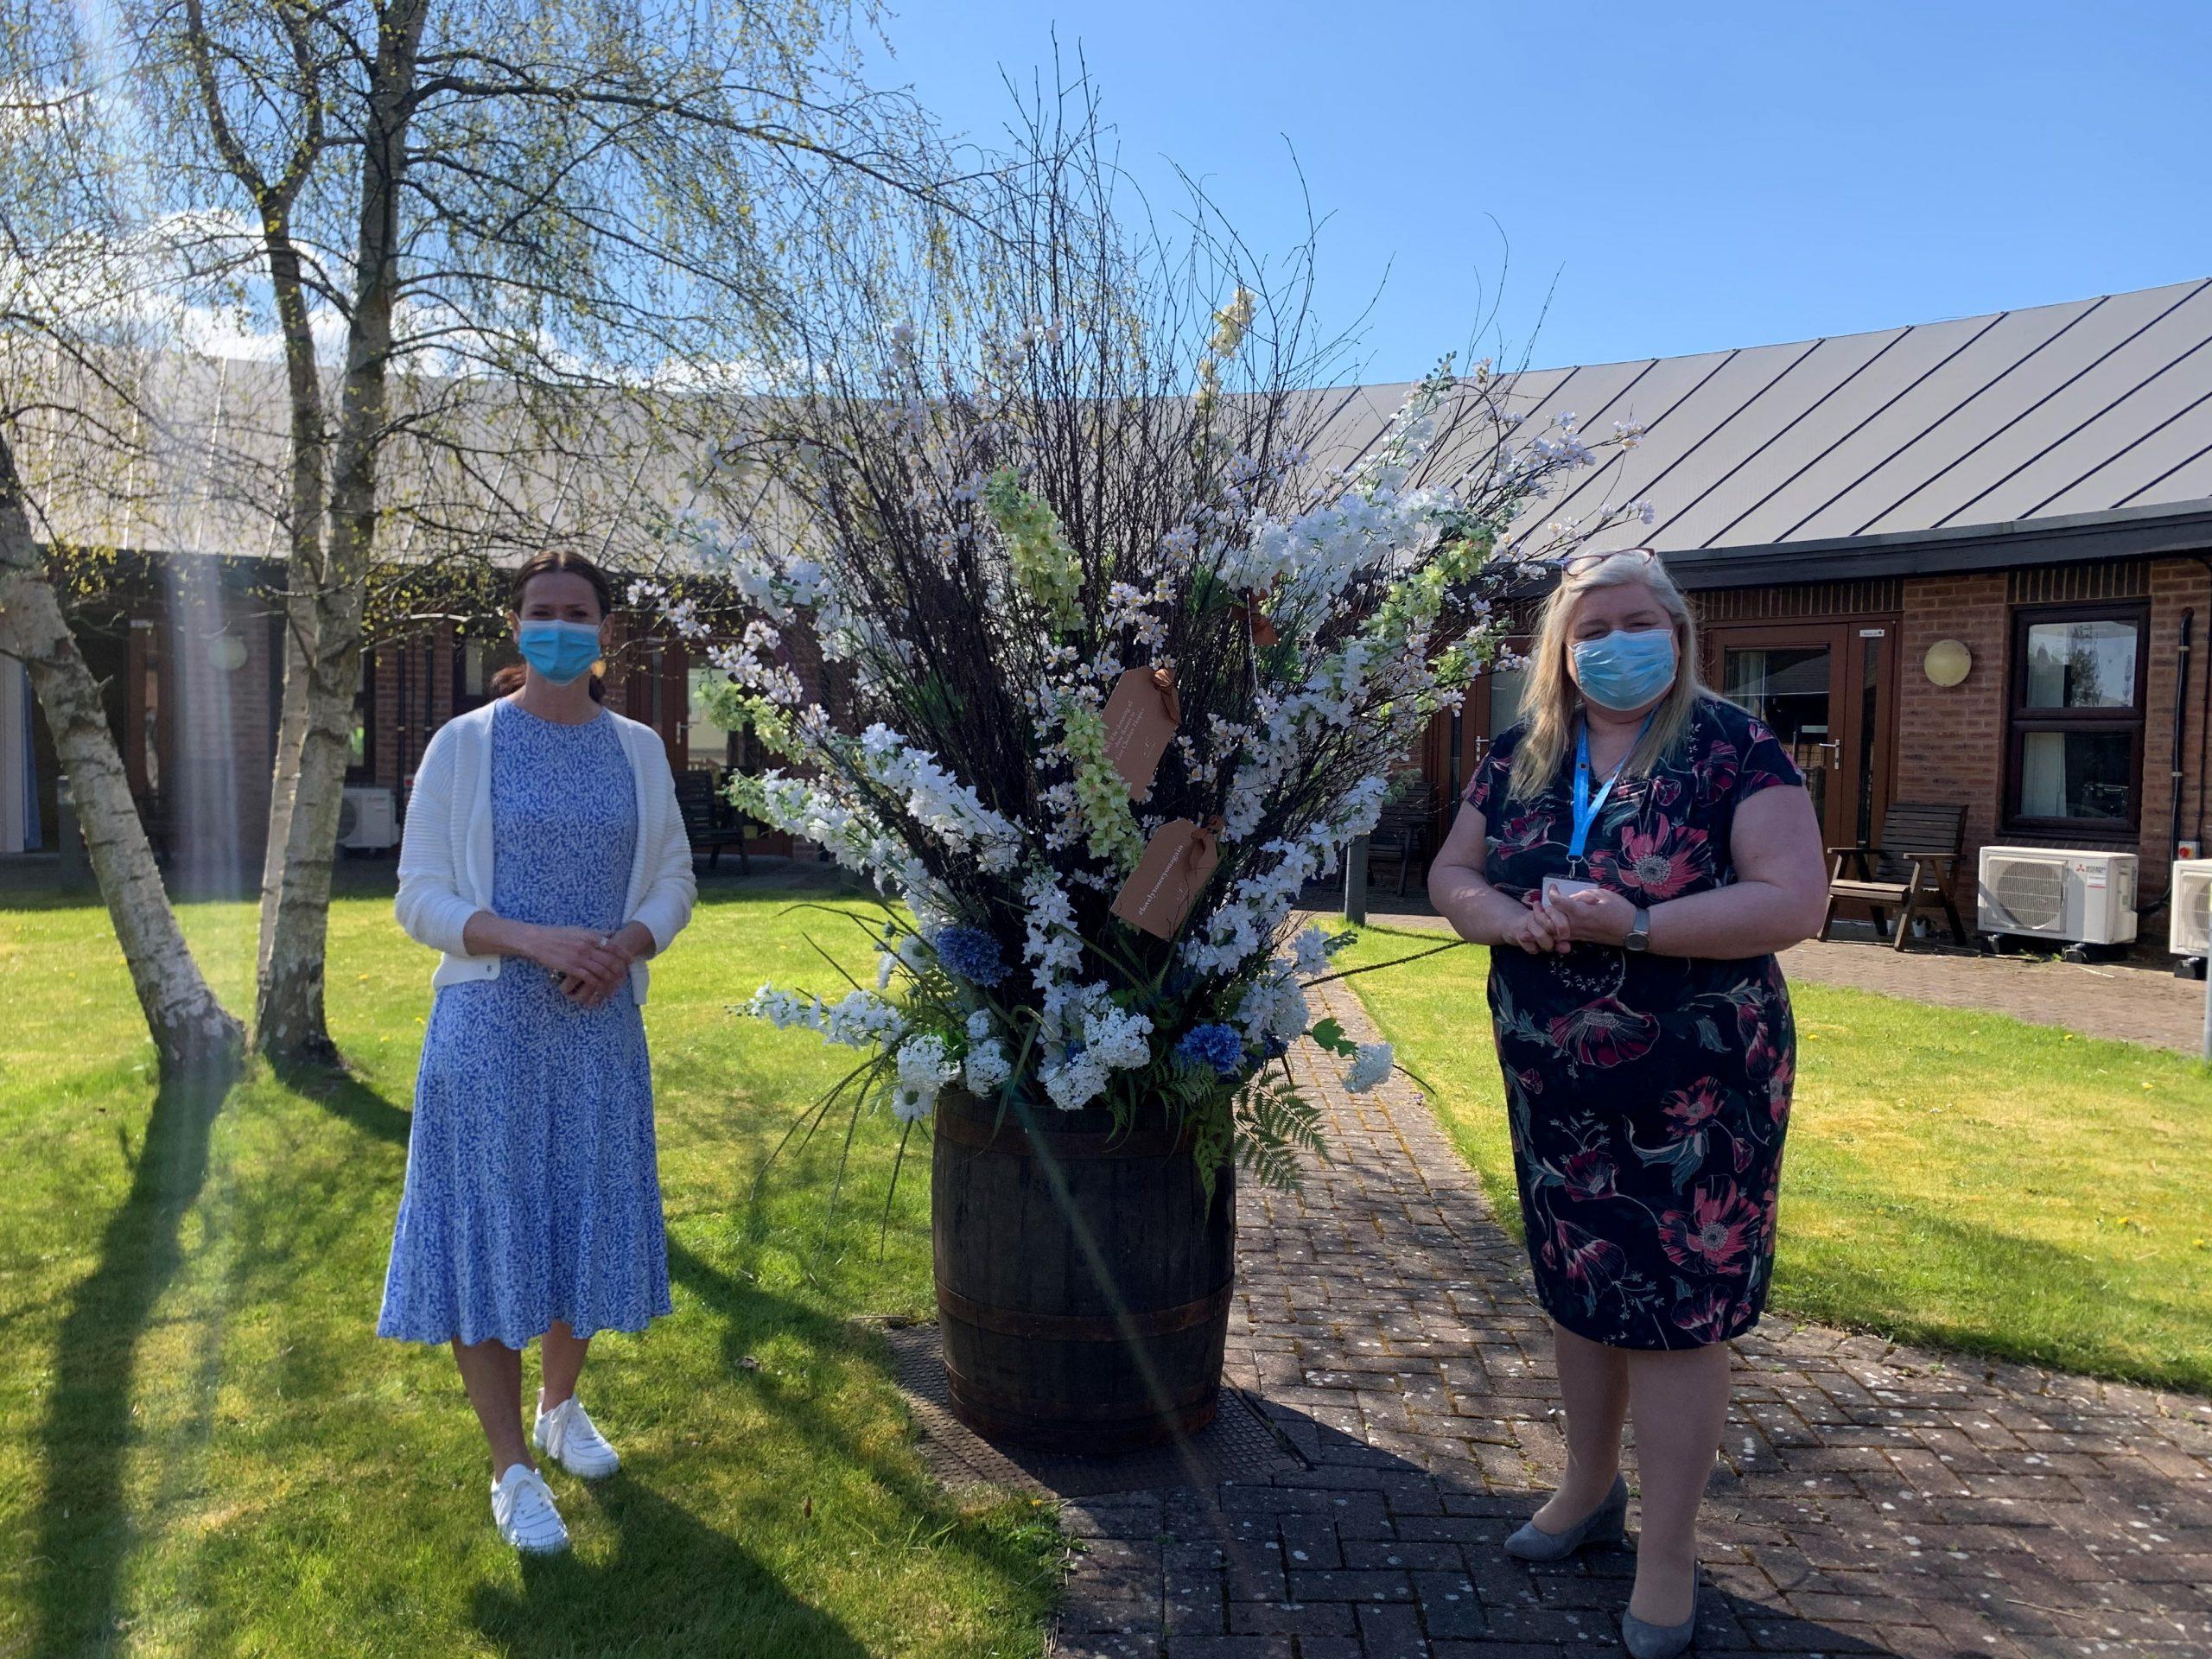 Neptune Shop Donates Flower Display